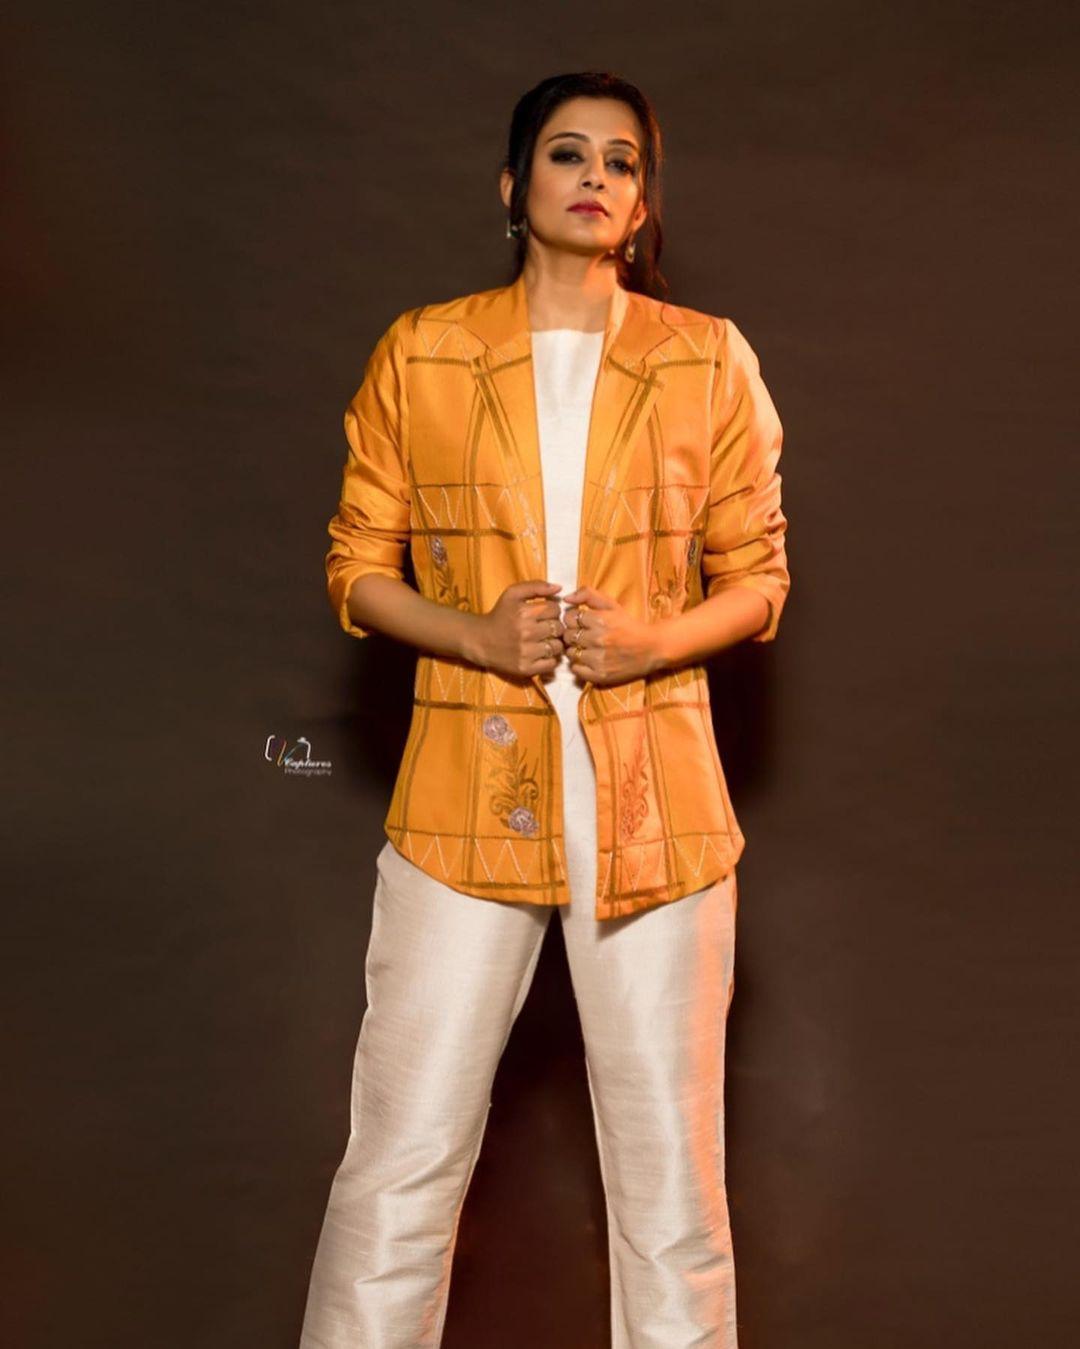 Beautiful actress Priya Mani in Krishnamani outfit for Dhee kings vs queens. 2021-09-01